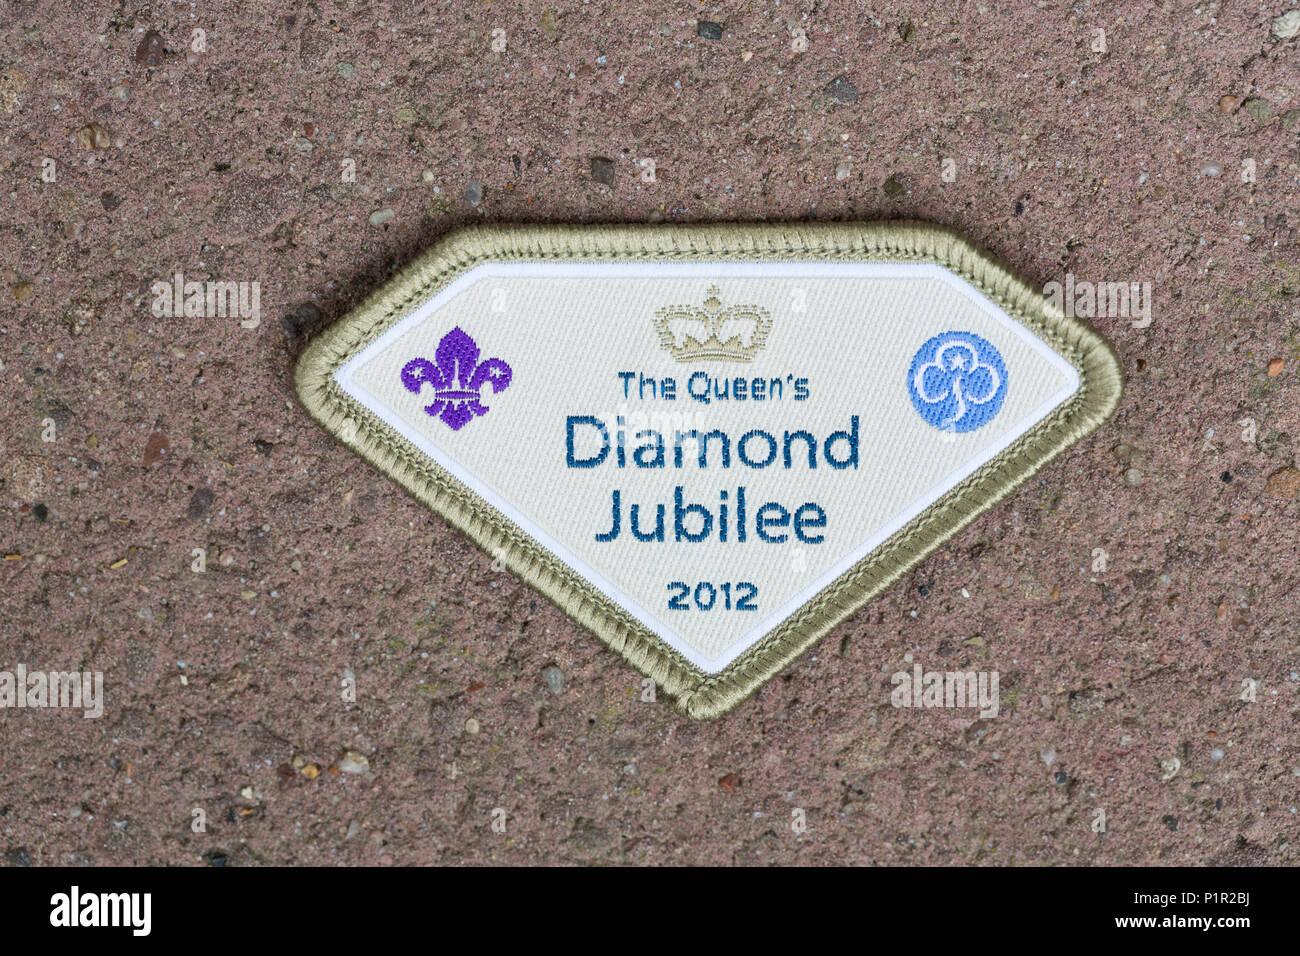 Brownies badge to celebrate Queen's Diamond Jubilee in 2012 - Stock Image